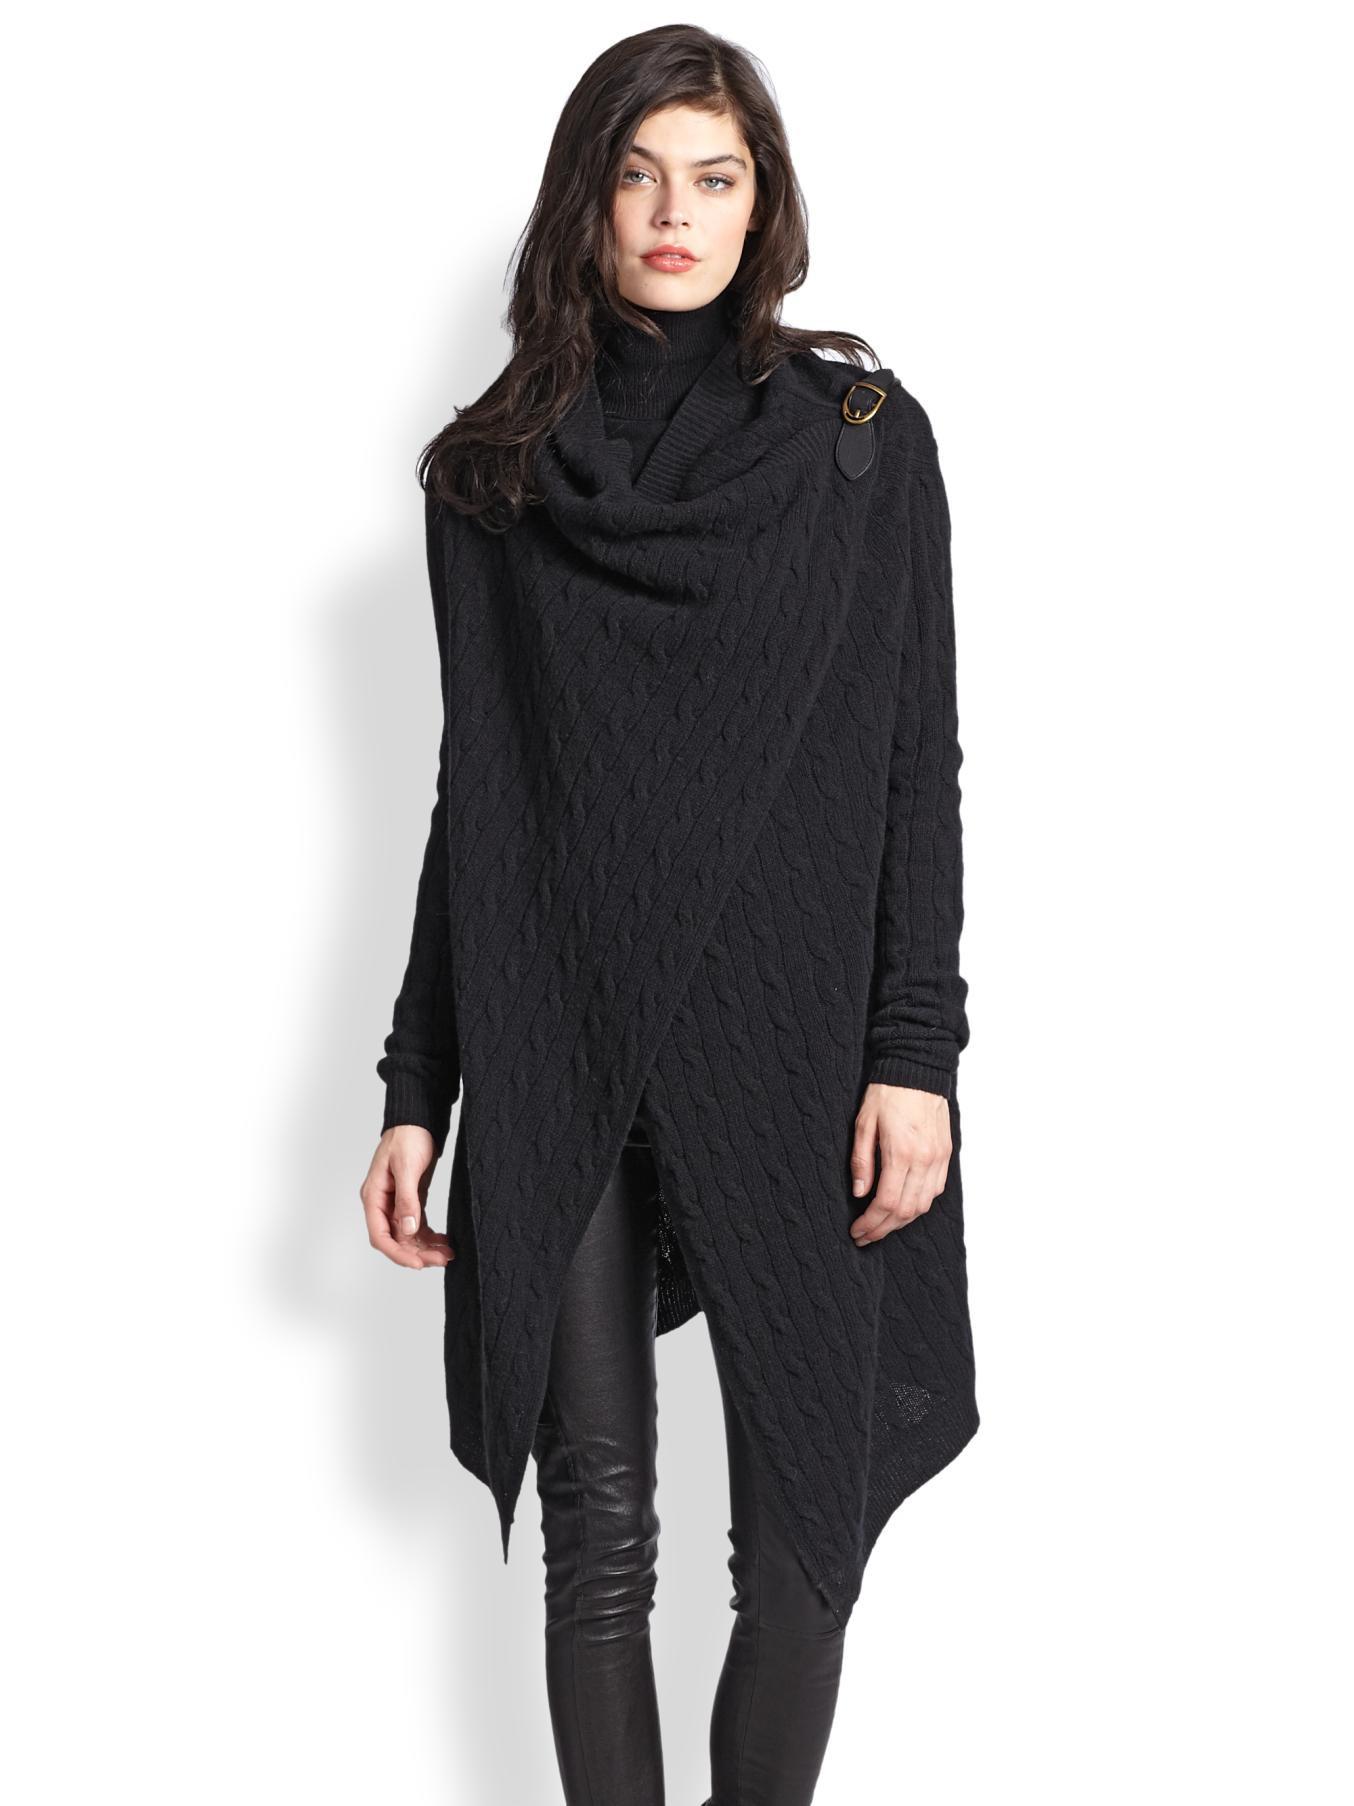 e029b1d87c Polo Ralph Lauren Wool   Cashmere Wrap Sweater in Black - Lyst